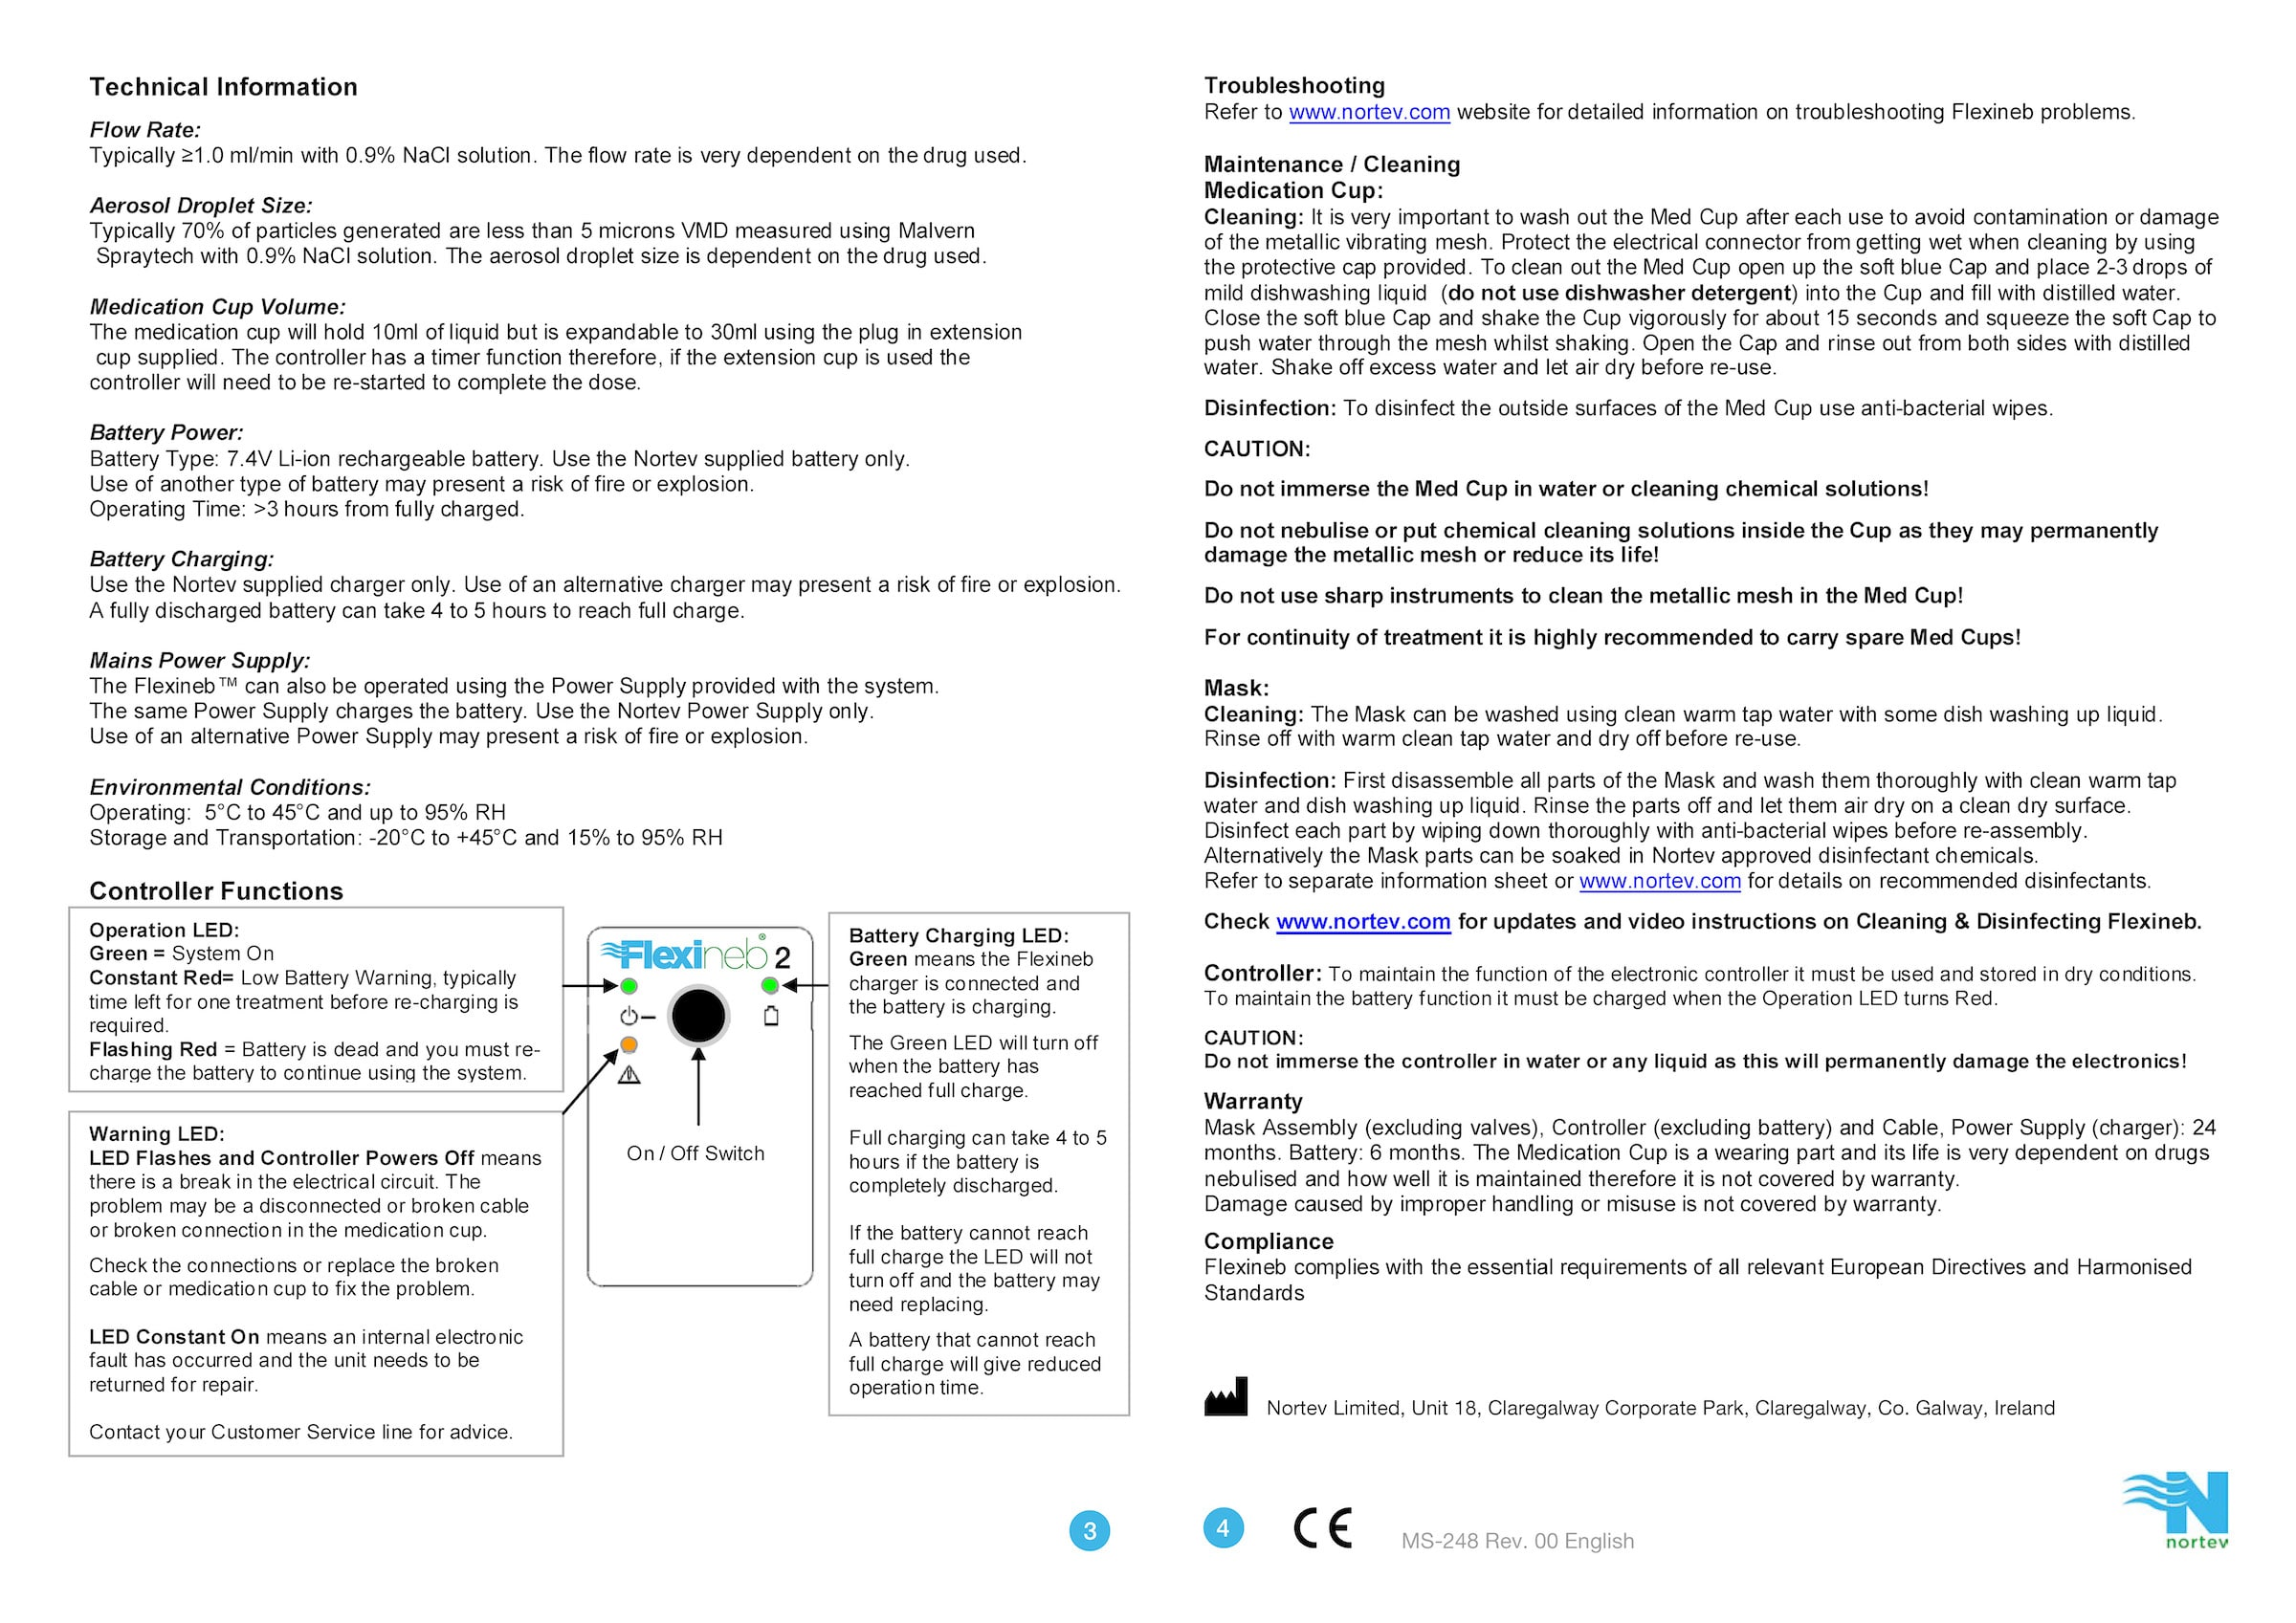 Flexineb E2 Instructions English Seite 2.jpg